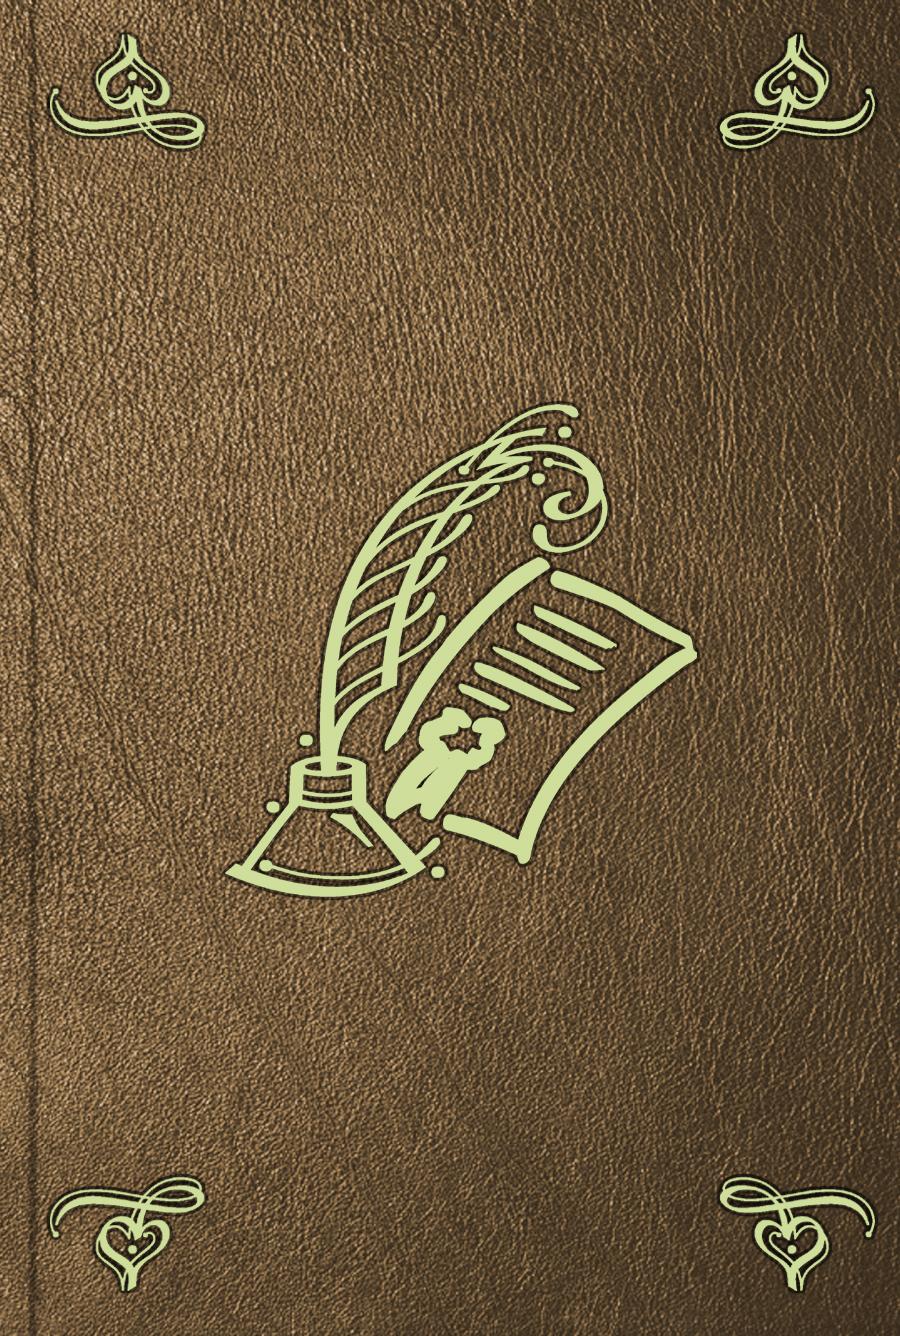 Arthur Collins The Peerage of England. Vol. 2 henry fritz gilbert genealogical gleanings in england waters the new england historical and genealogical register 1877